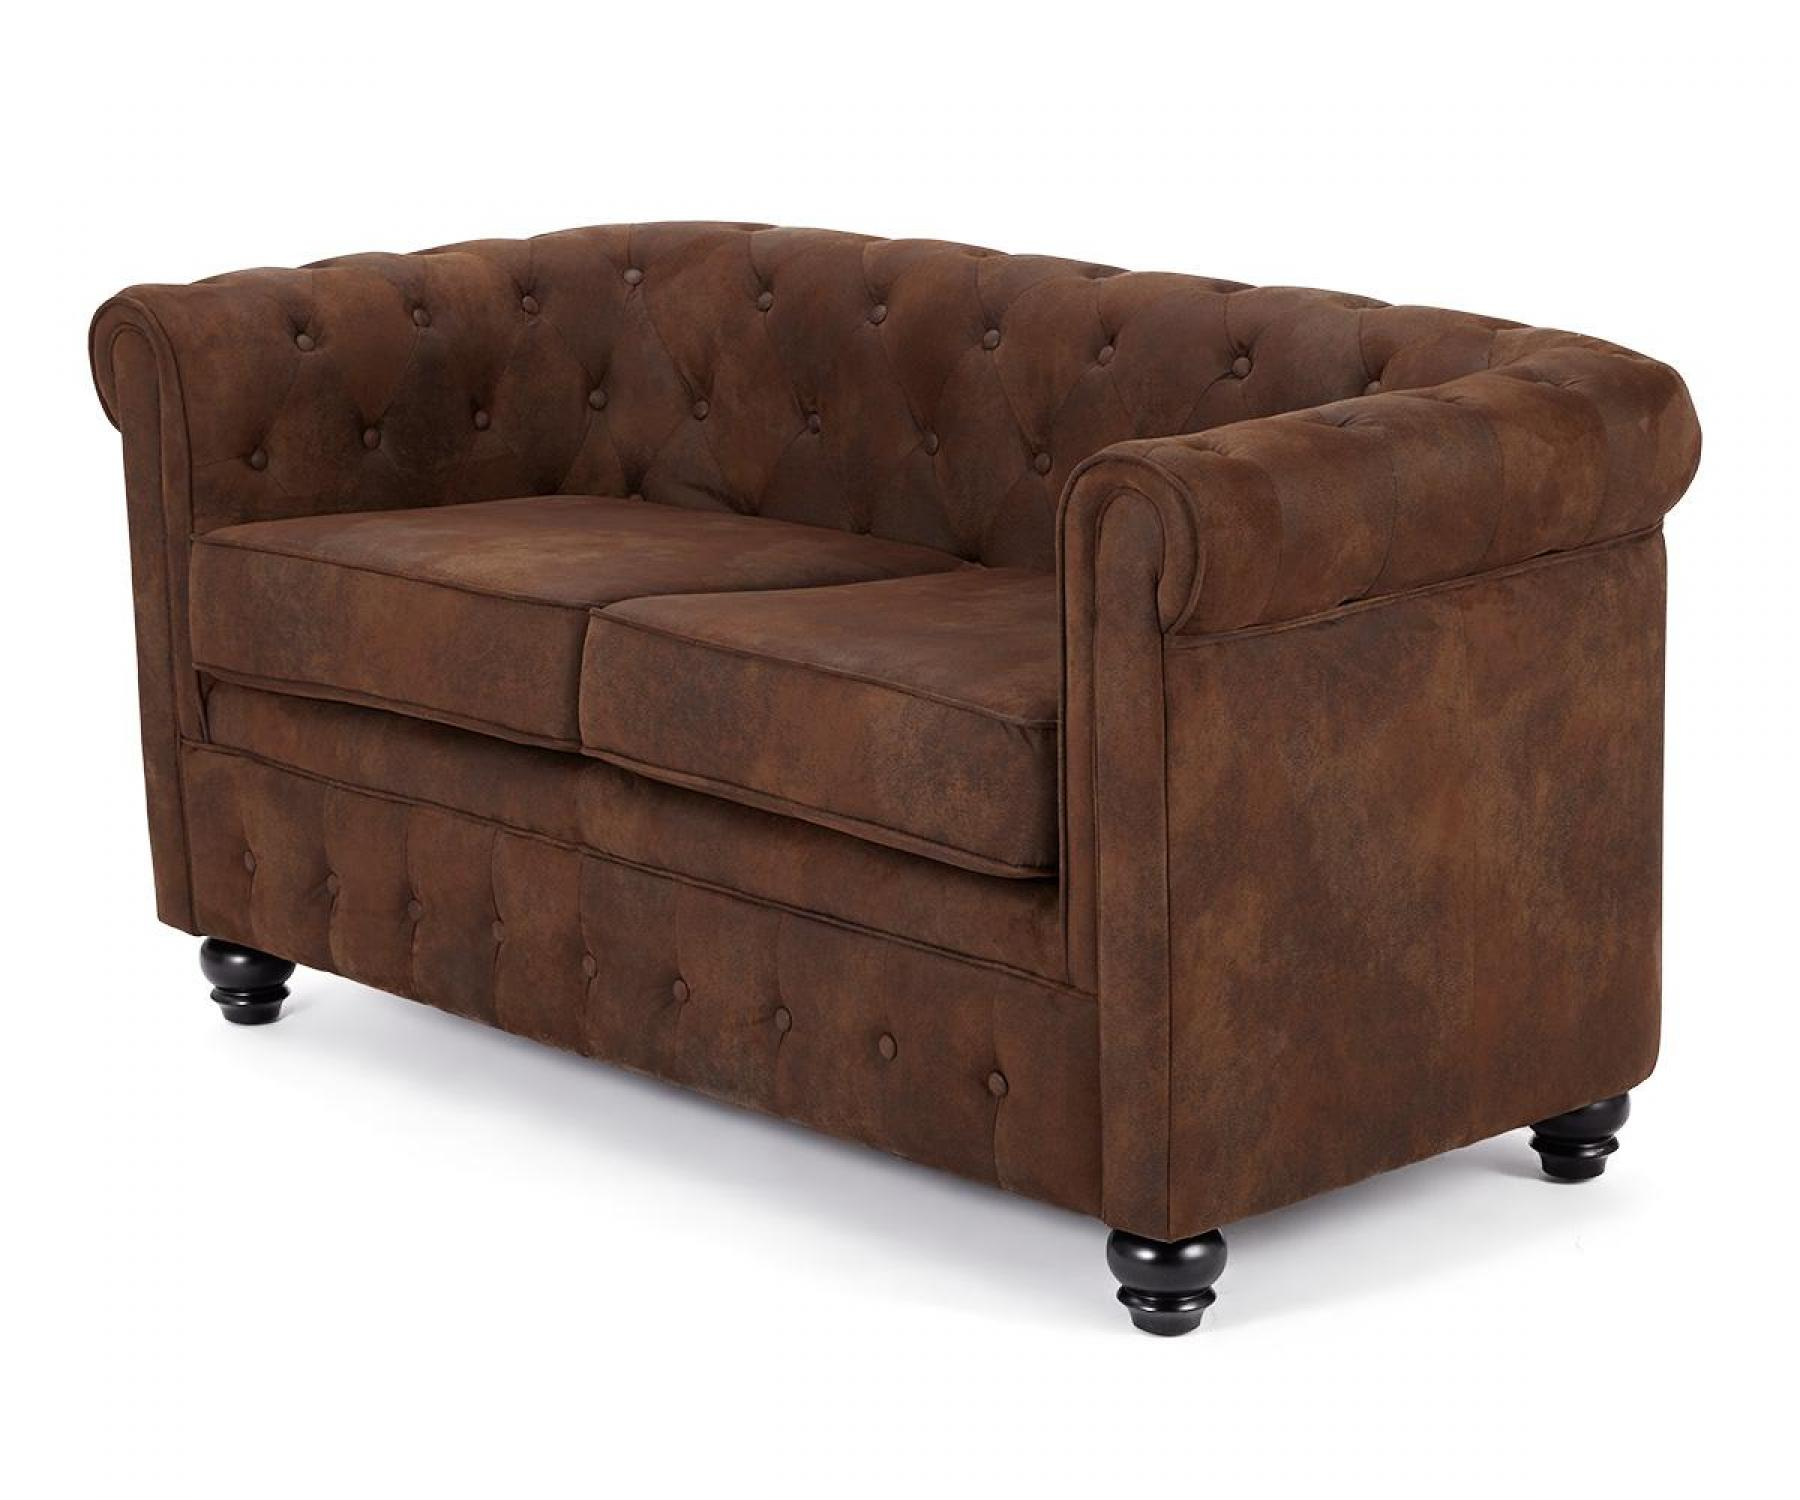 photos canap marron vieilli. Black Bedroom Furniture Sets. Home Design Ideas